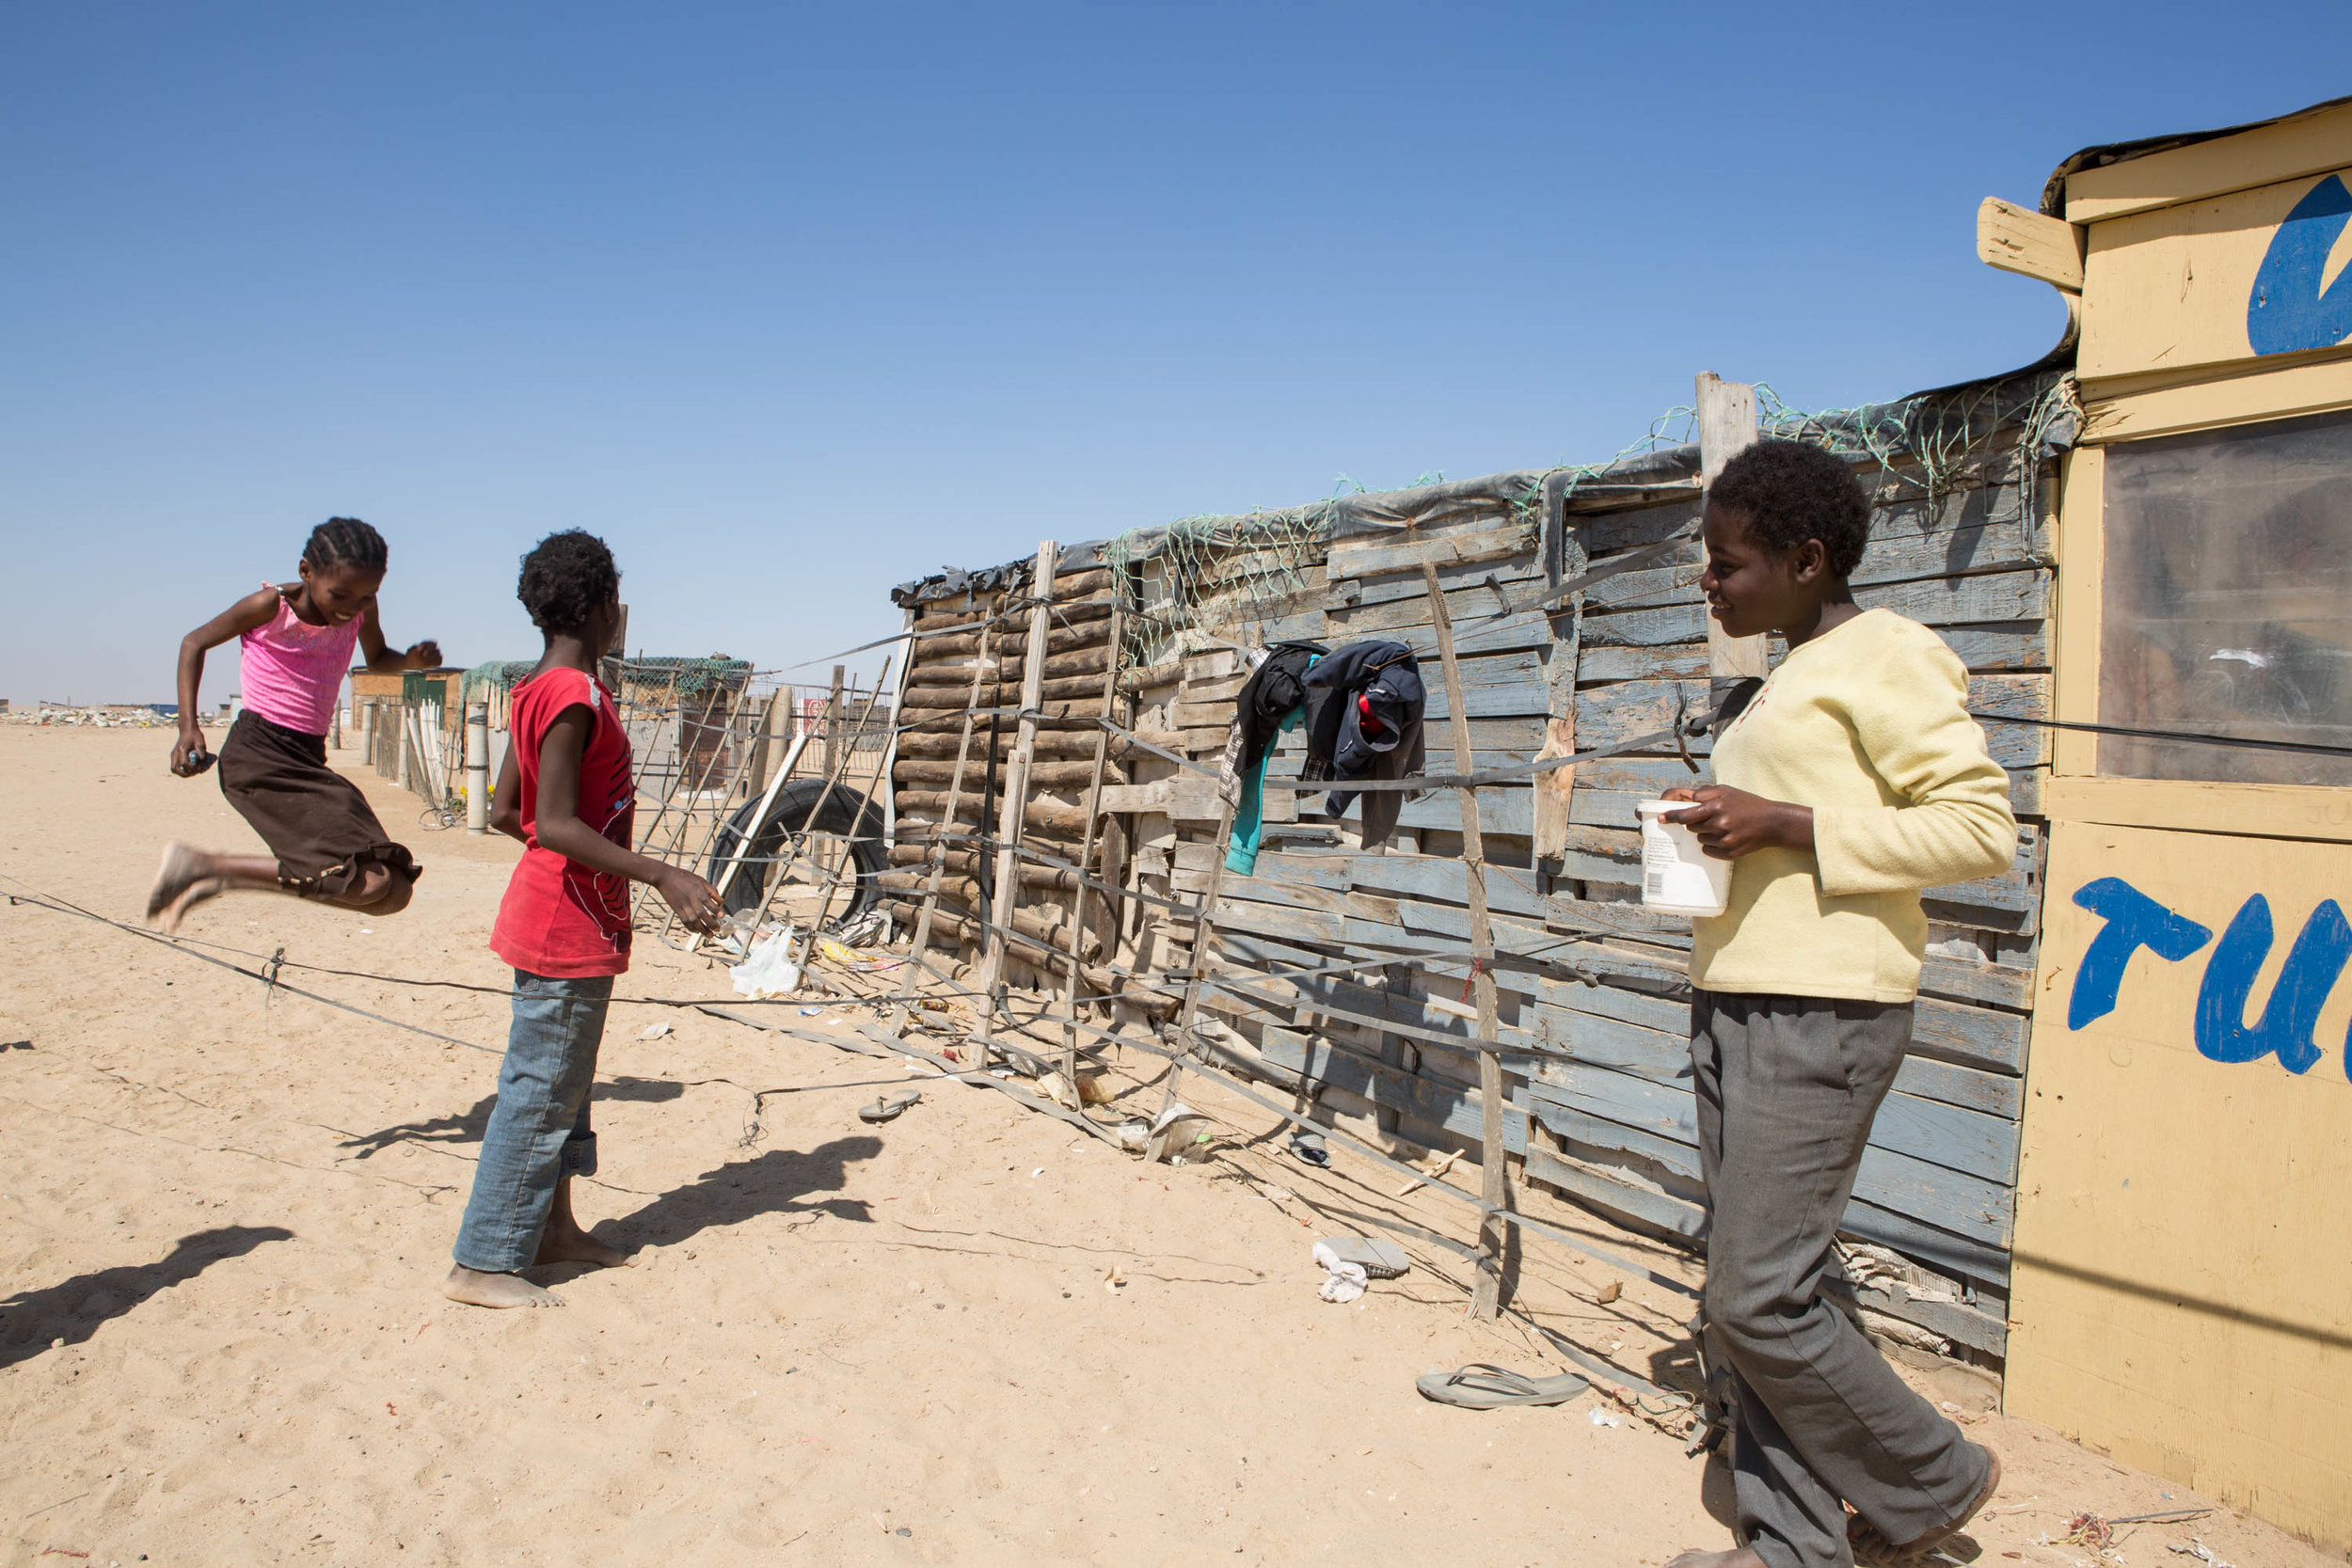 namibia - drc clinic - synergos 2014-136